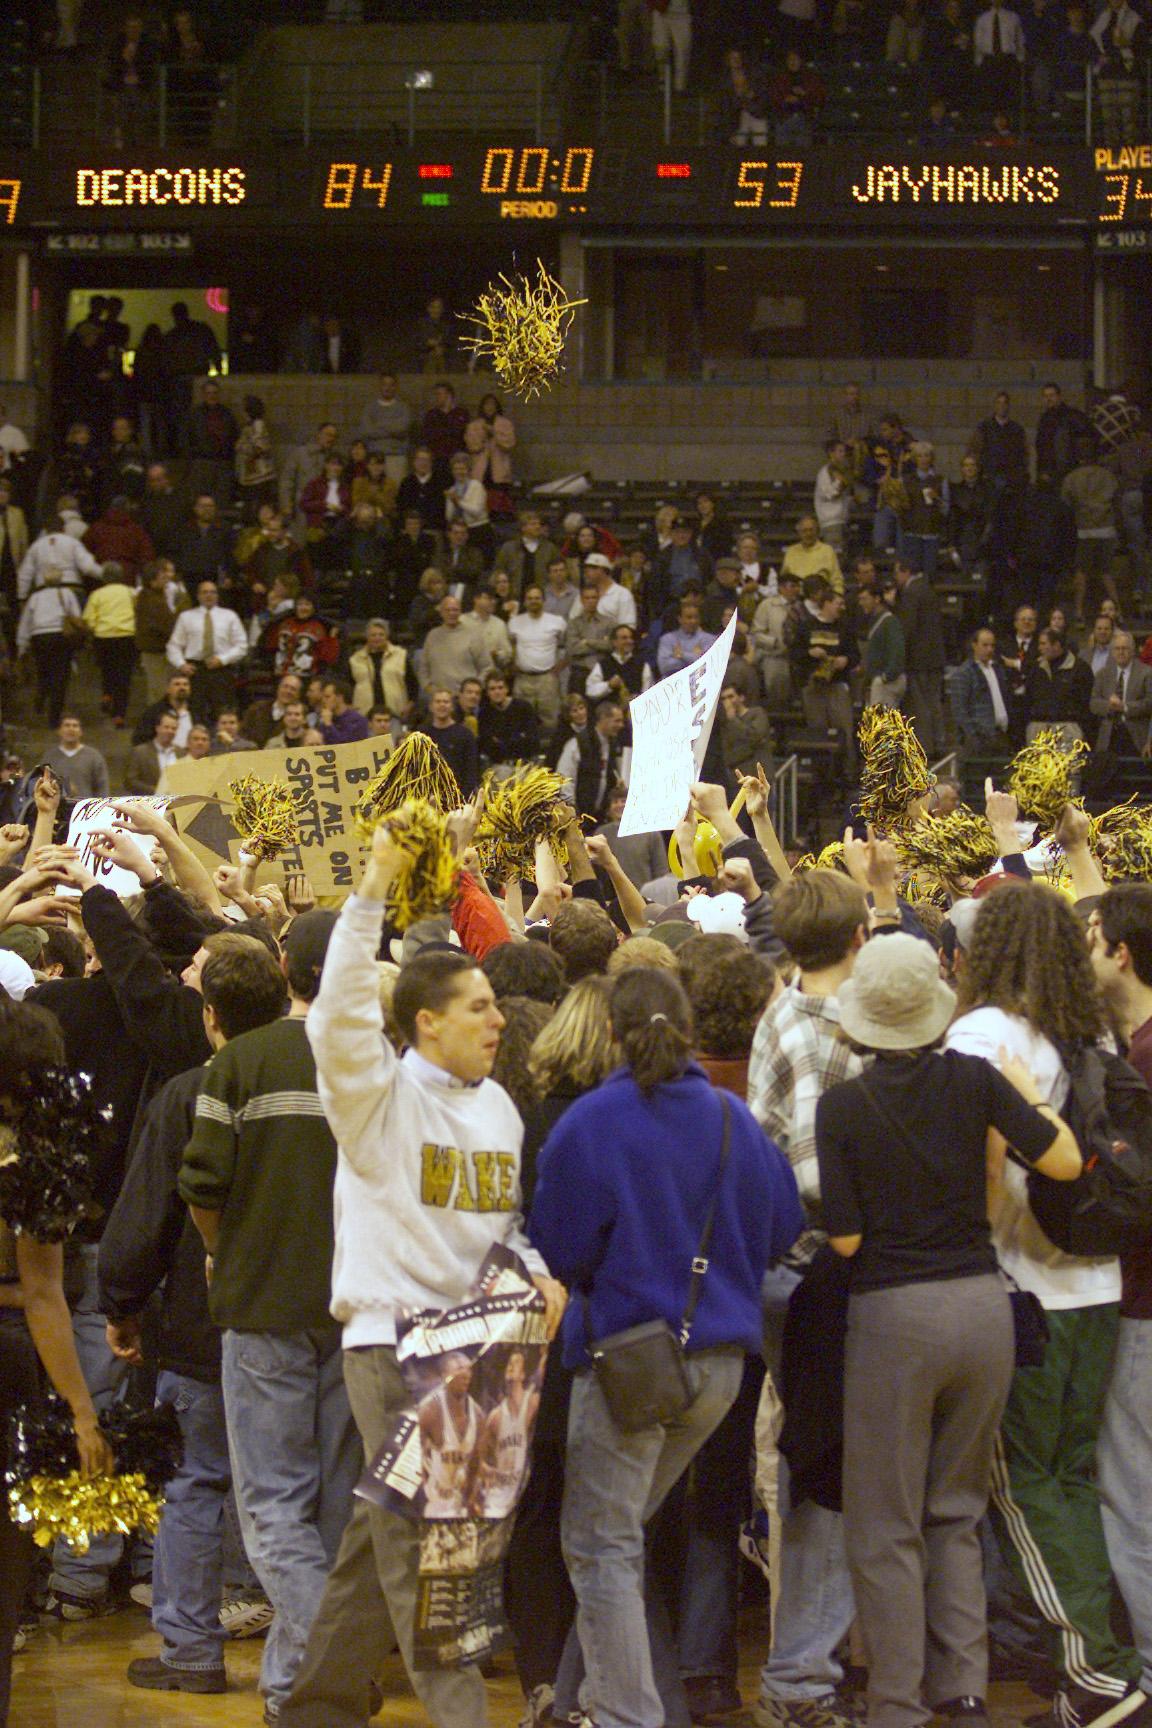 7 Nov 2000:   Wake Forest Demon Deacons fans celebrate their 84-53 victory over the Kansas Jayhawks at Joel Coliseum in Winston Salem, North Carolina. Mandatory DIGITAL IMAGE Credit: Craig Jones/ALLSPORT